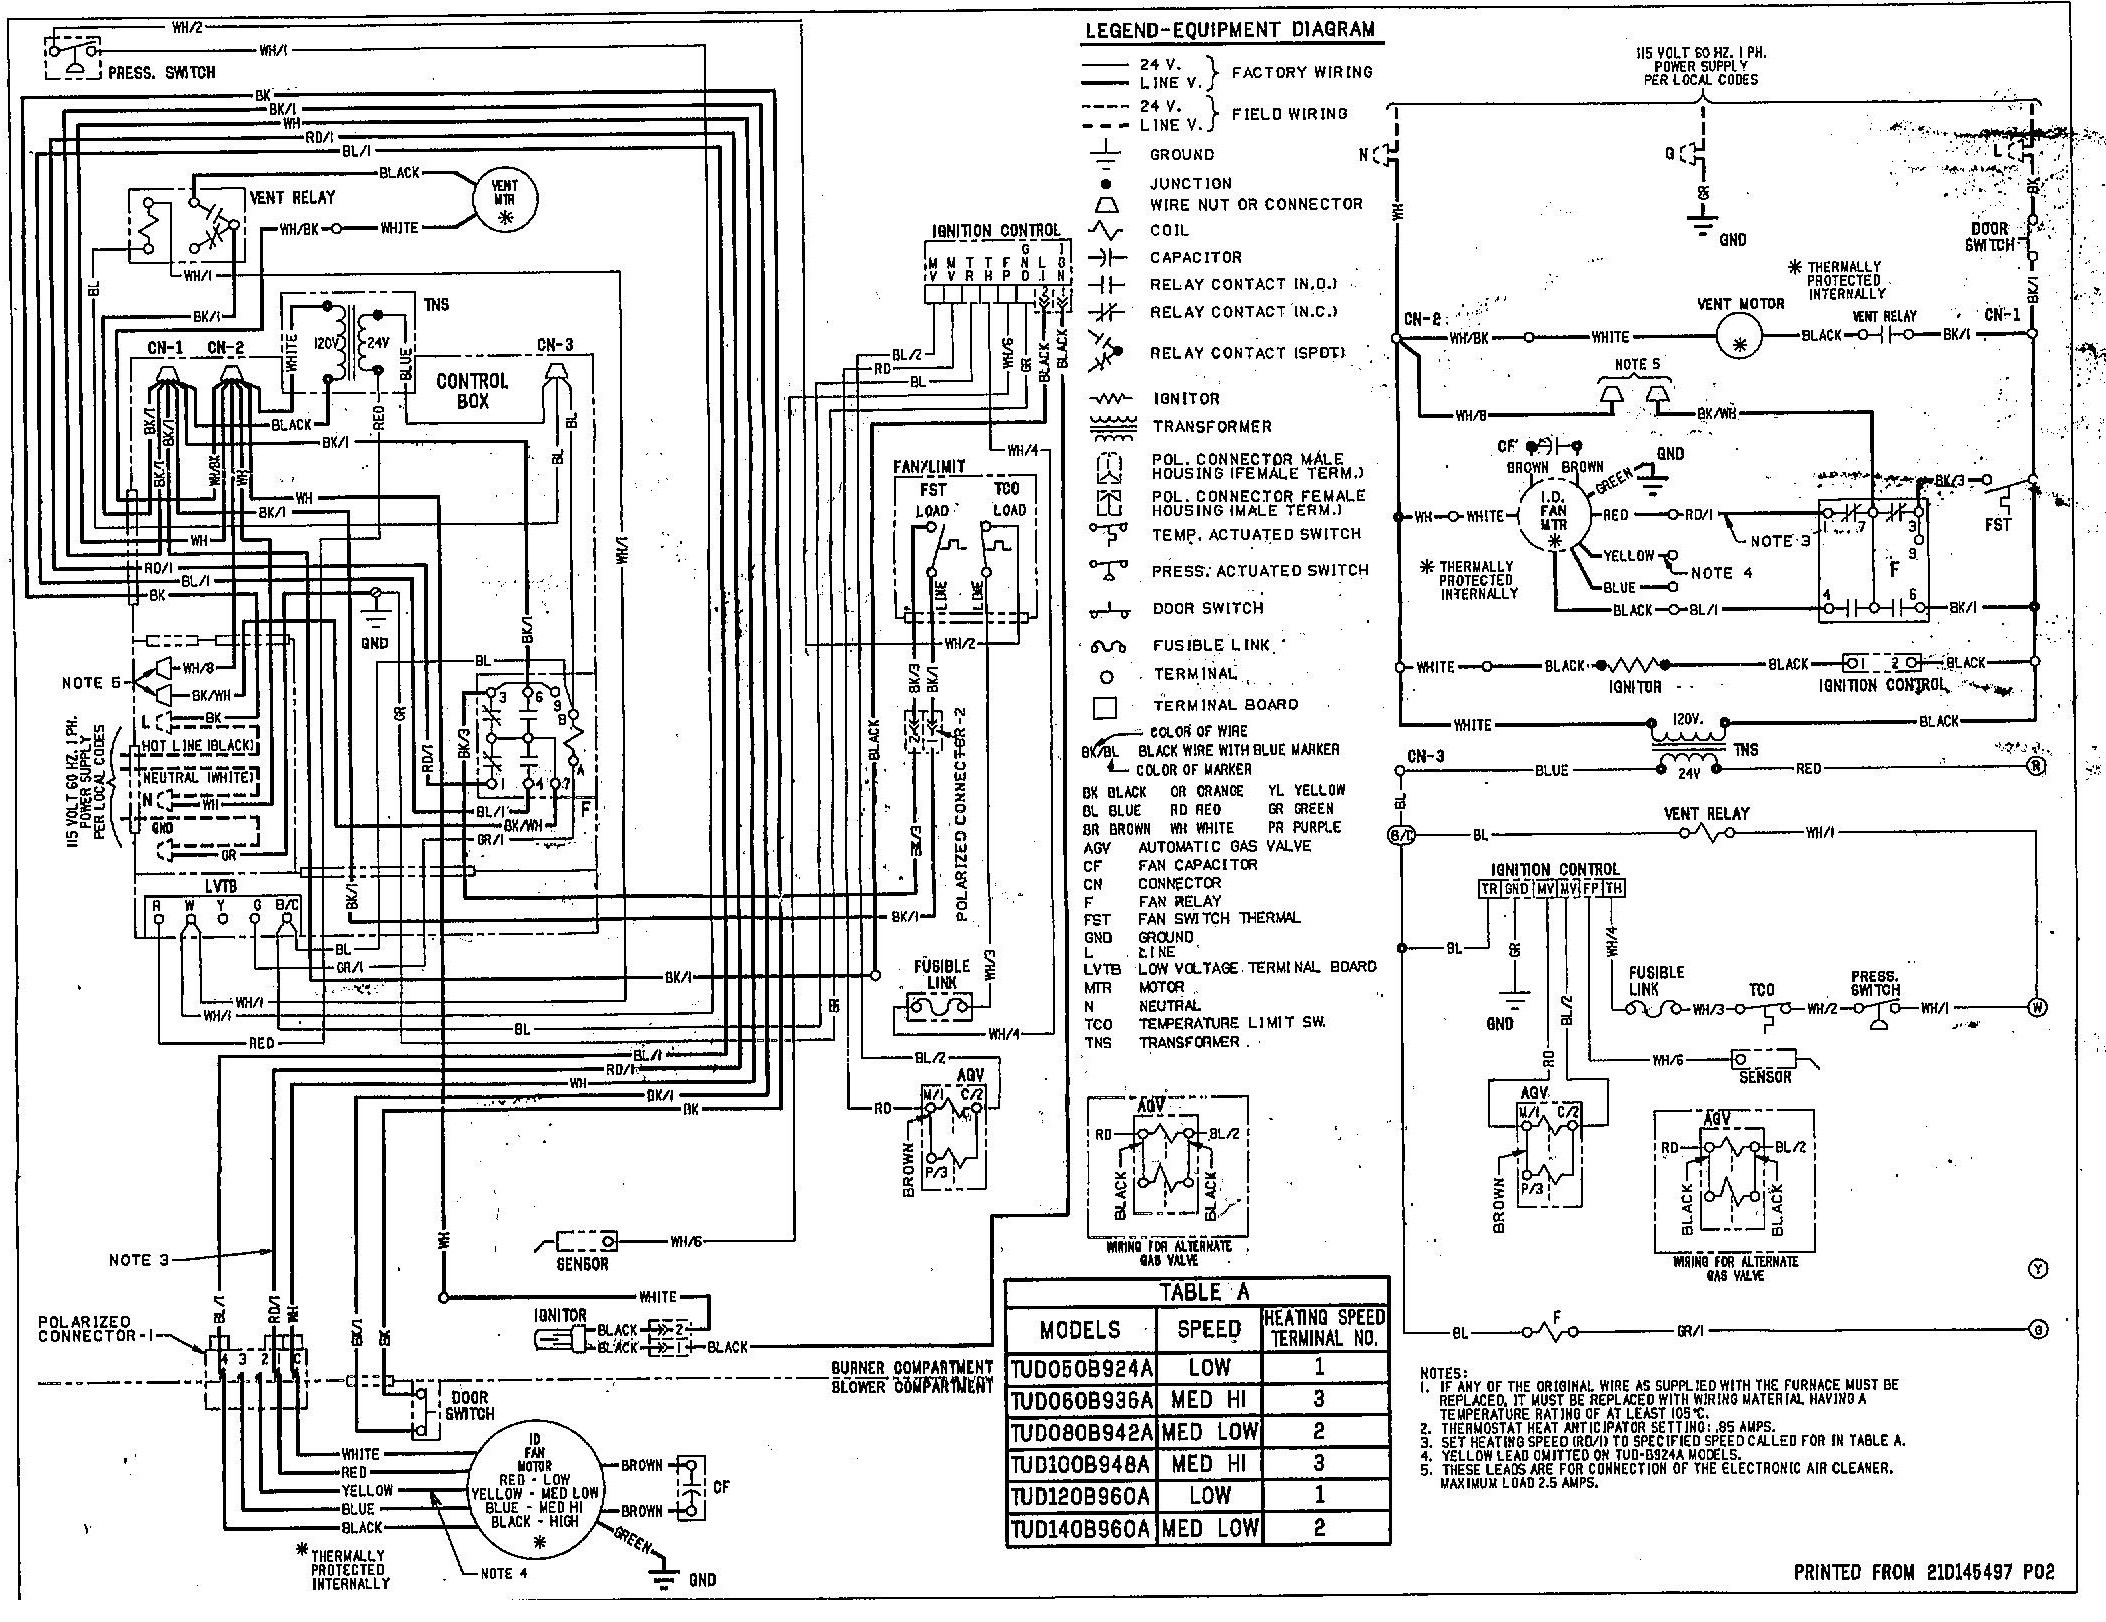 Weatherking Air Handler Wiring Diagram